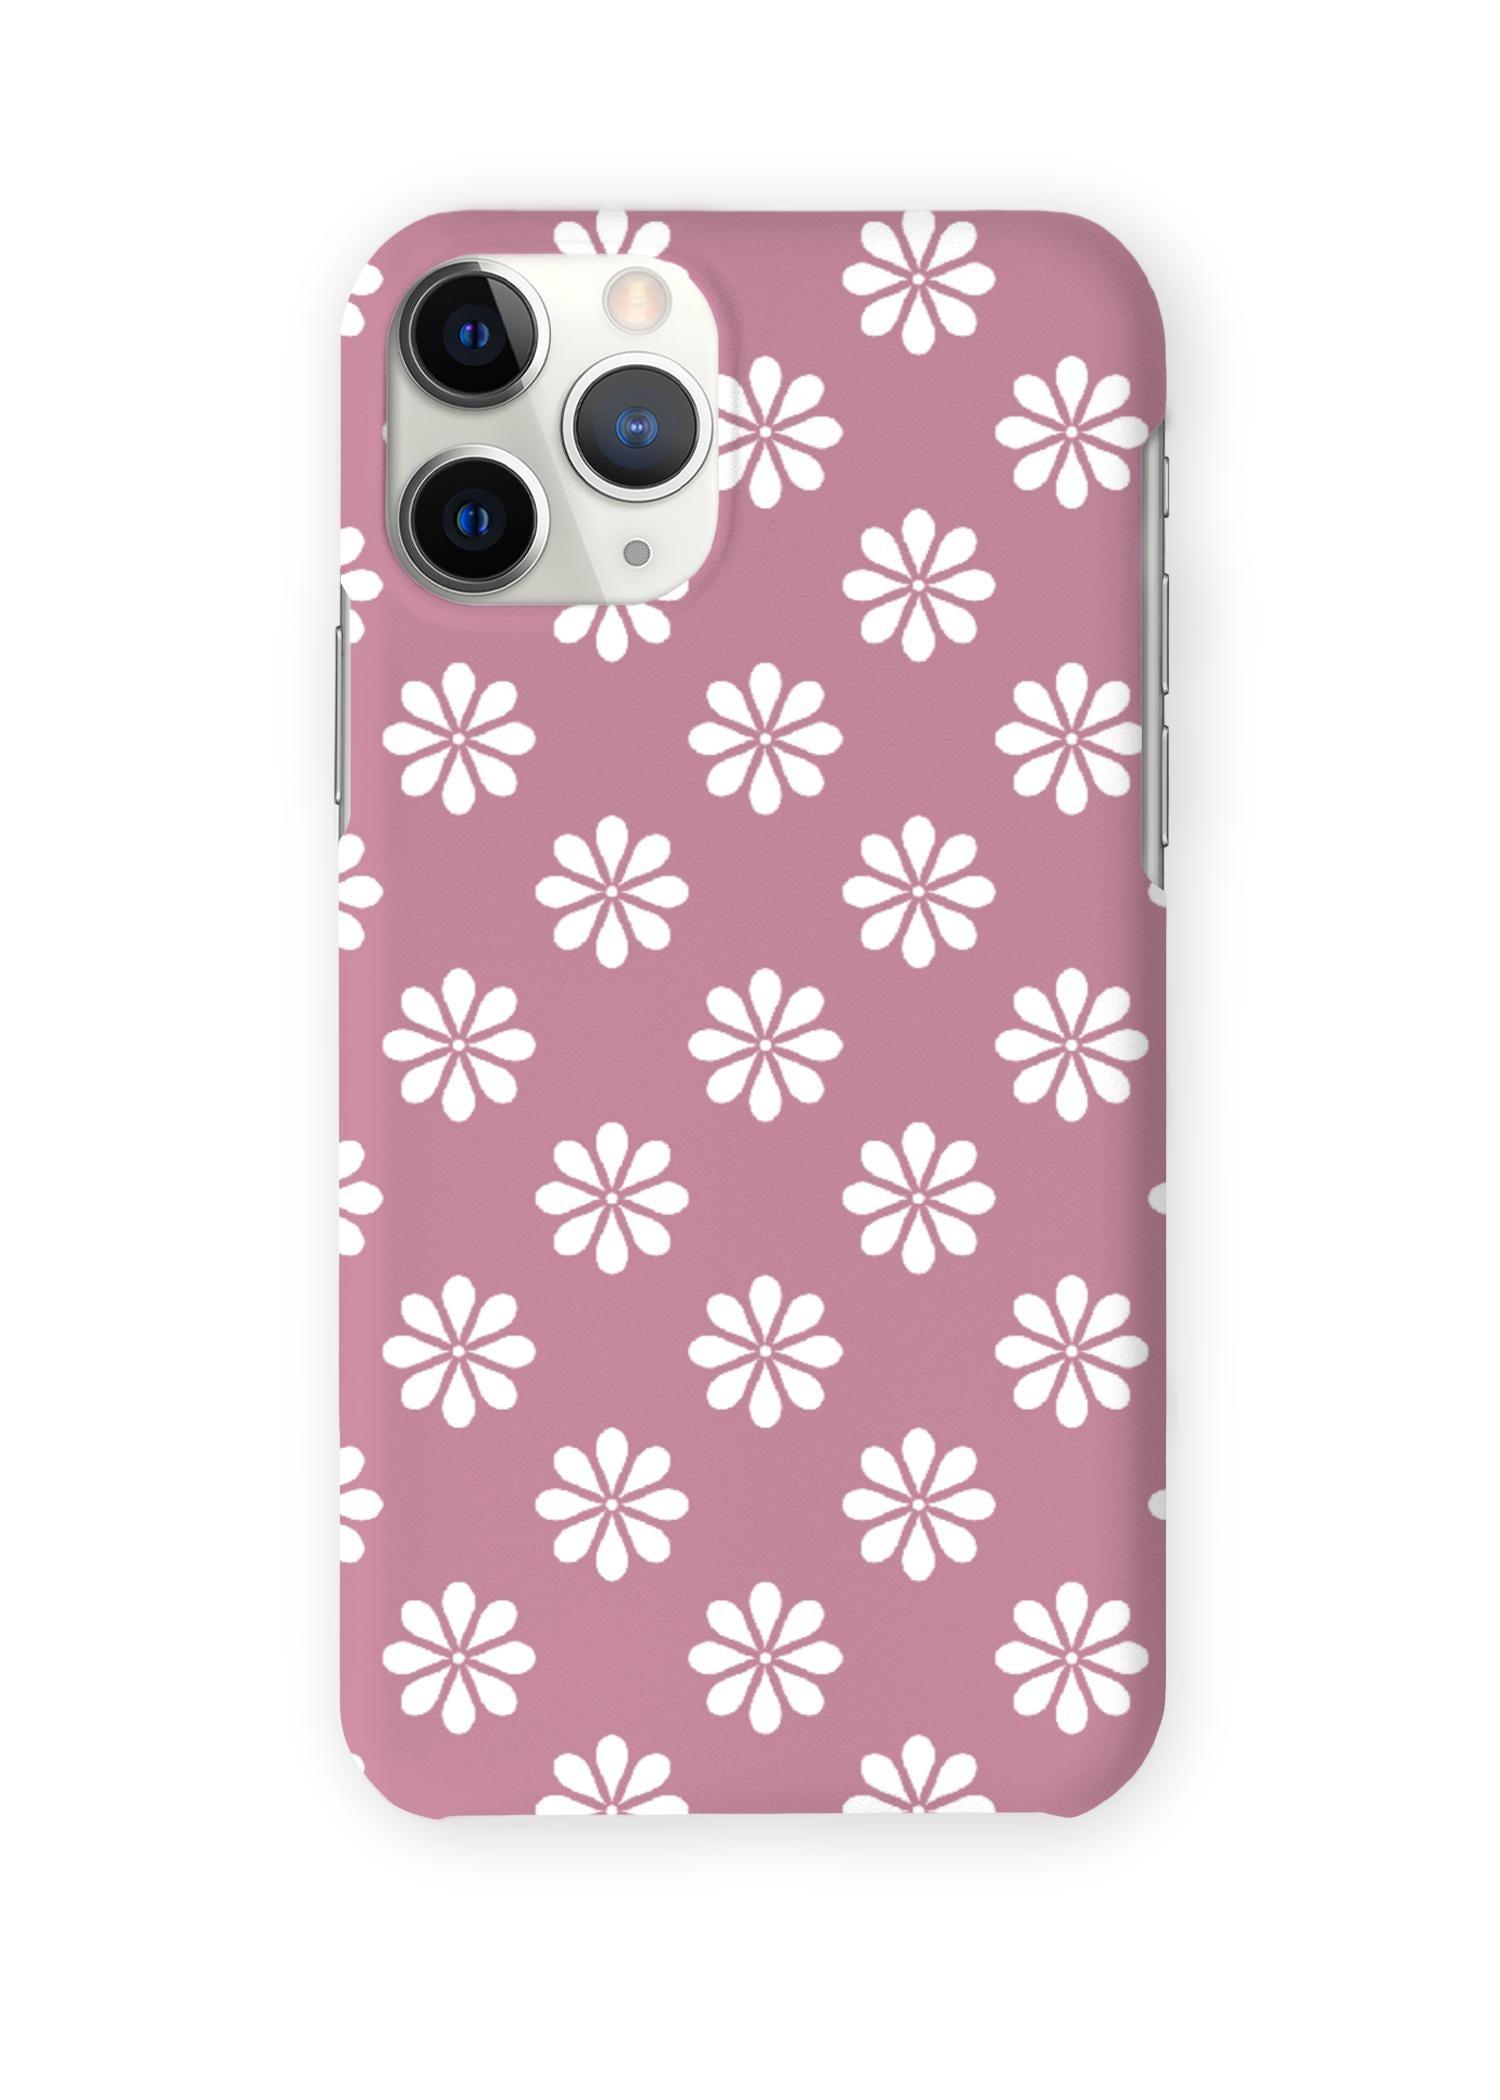 VIDA iPhone Case - Cannon Pink Garden by VIDA Original Artist  - Size: iPhone 11 Pro / Ultraslim